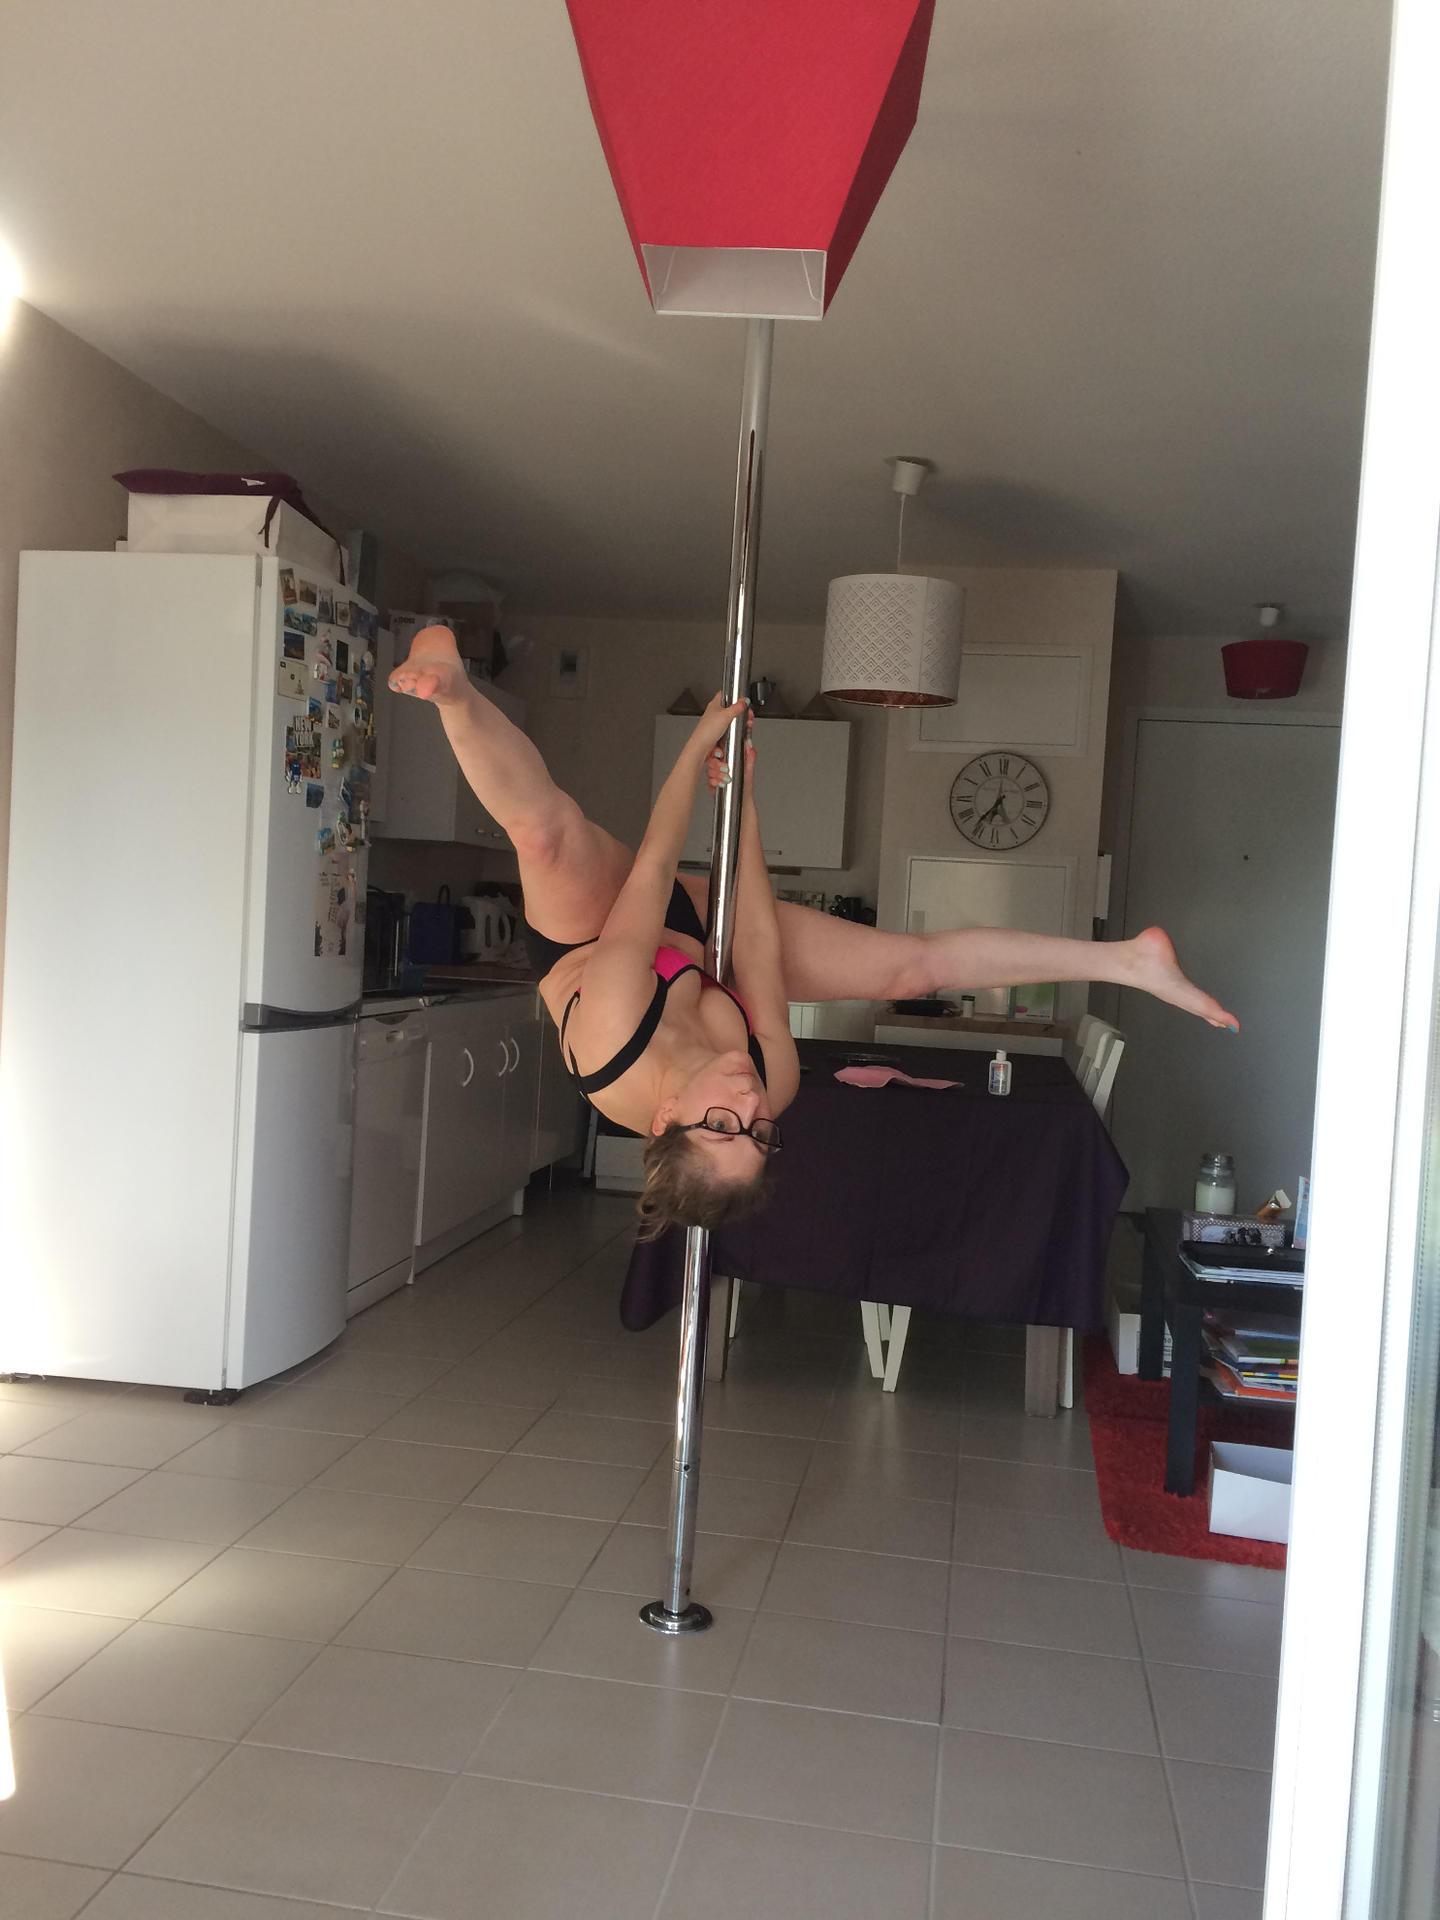 la pole dance delphine cosmetic diary blog beaut lifestyle lyon. Black Bedroom Furniture Sets. Home Design Ideas